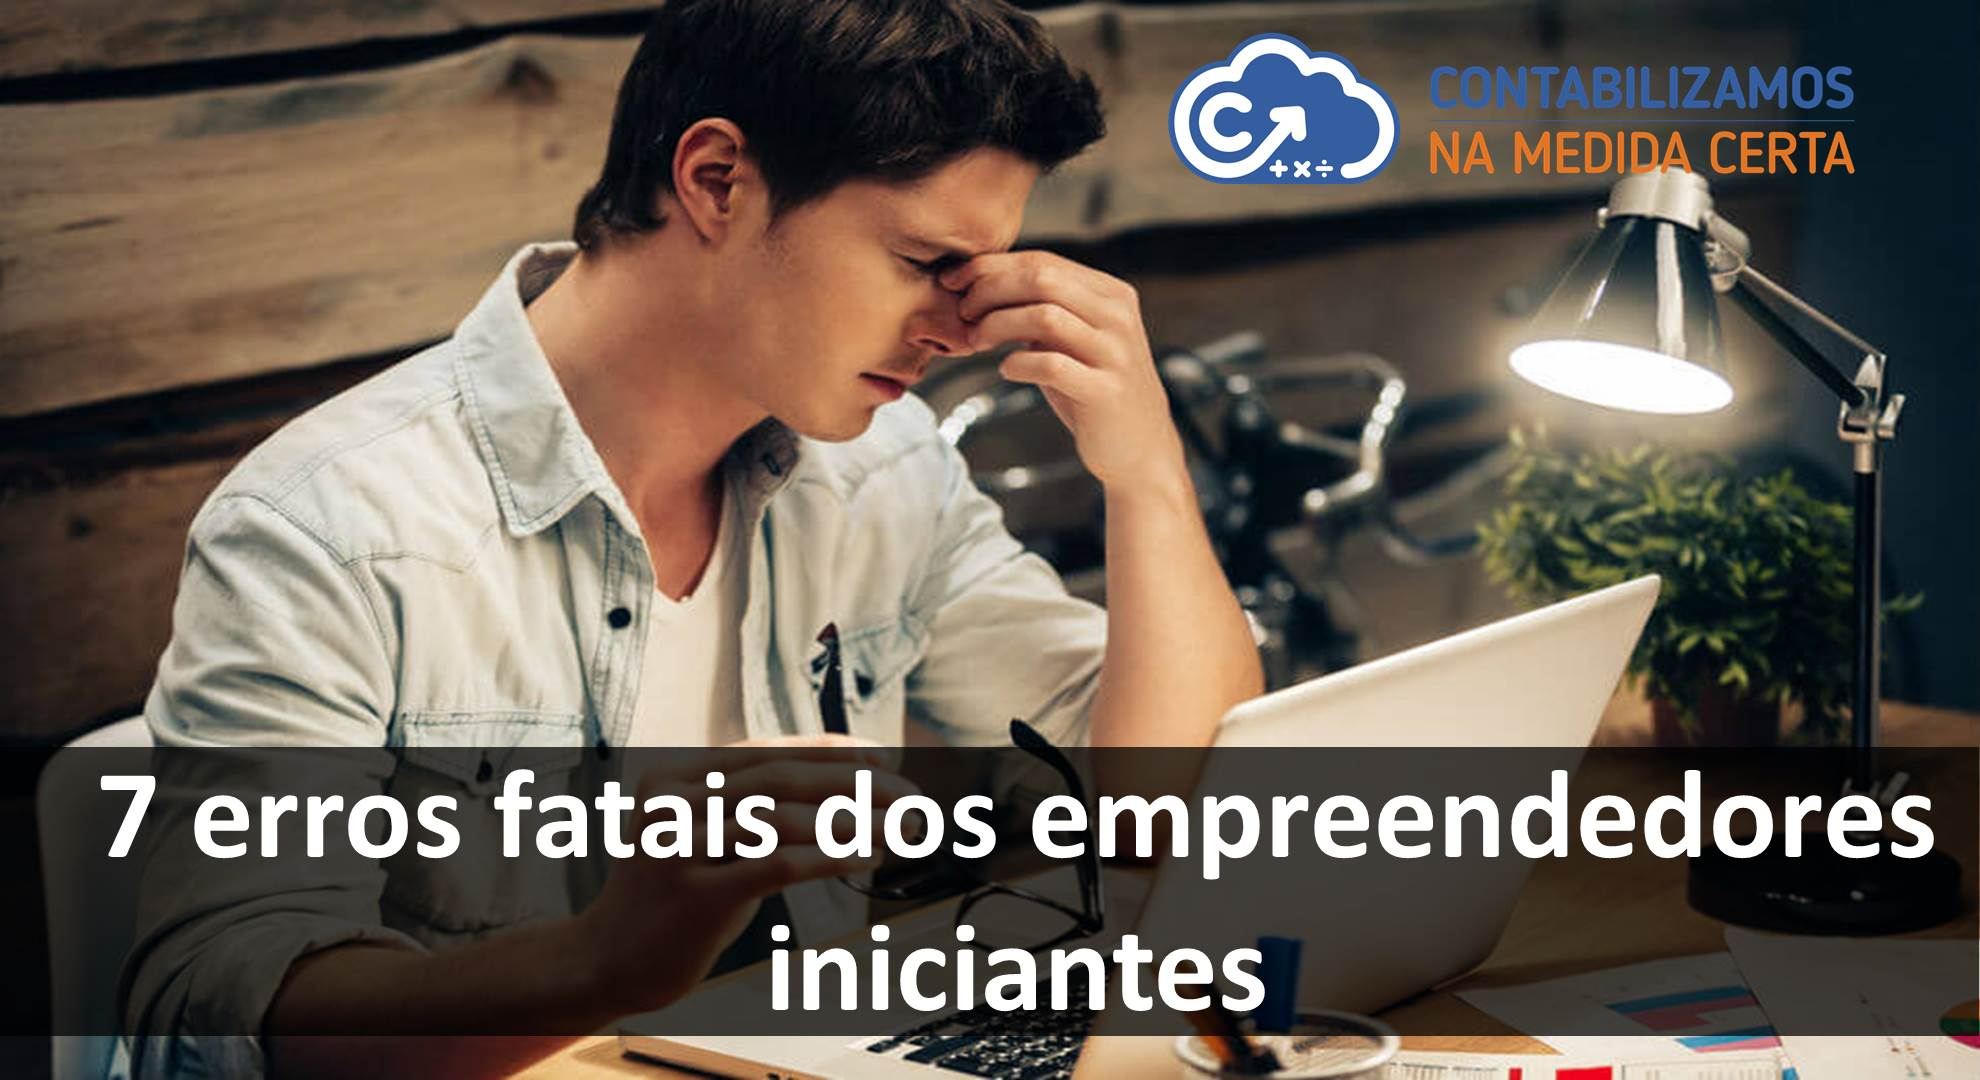 7 Erros Fatais Dos Empreendedores Iniciantes